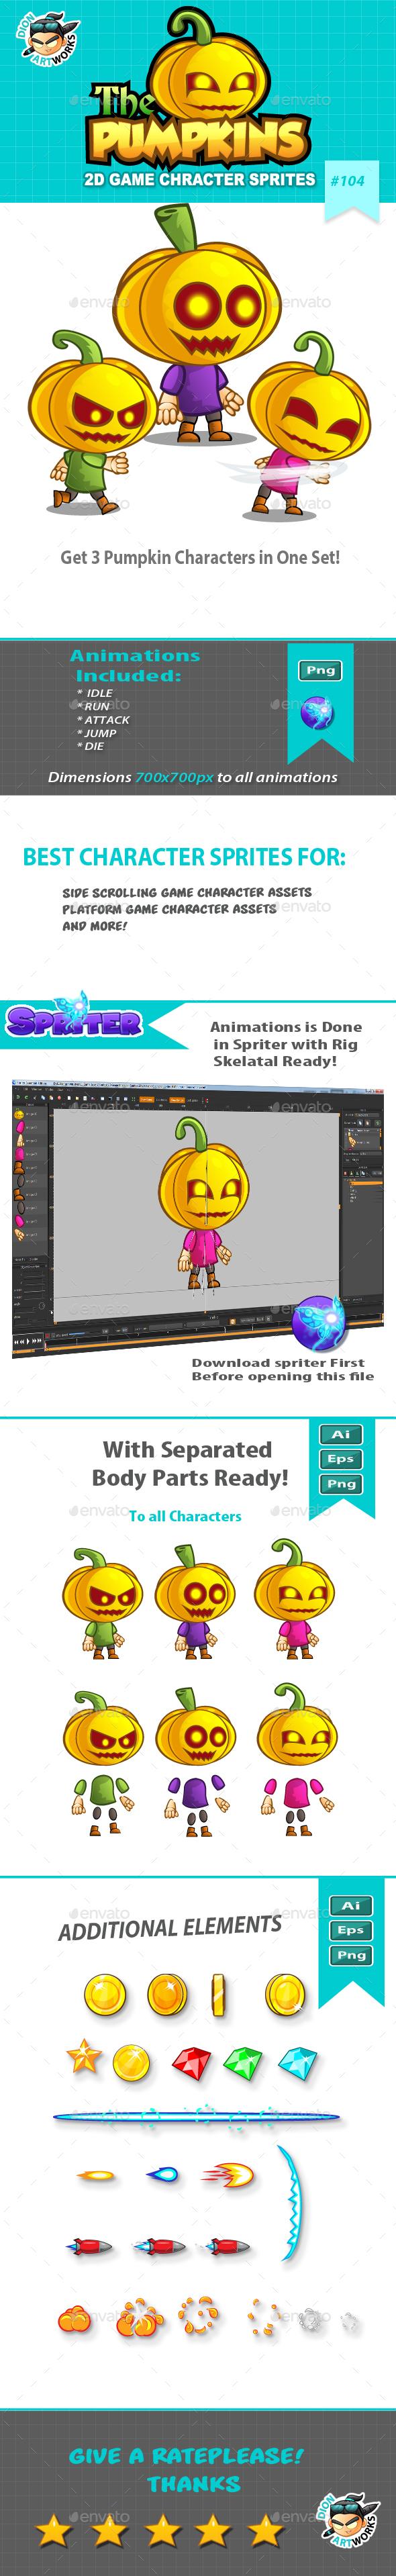 Pumpkins 2D Game Character Sprites (Sprites)